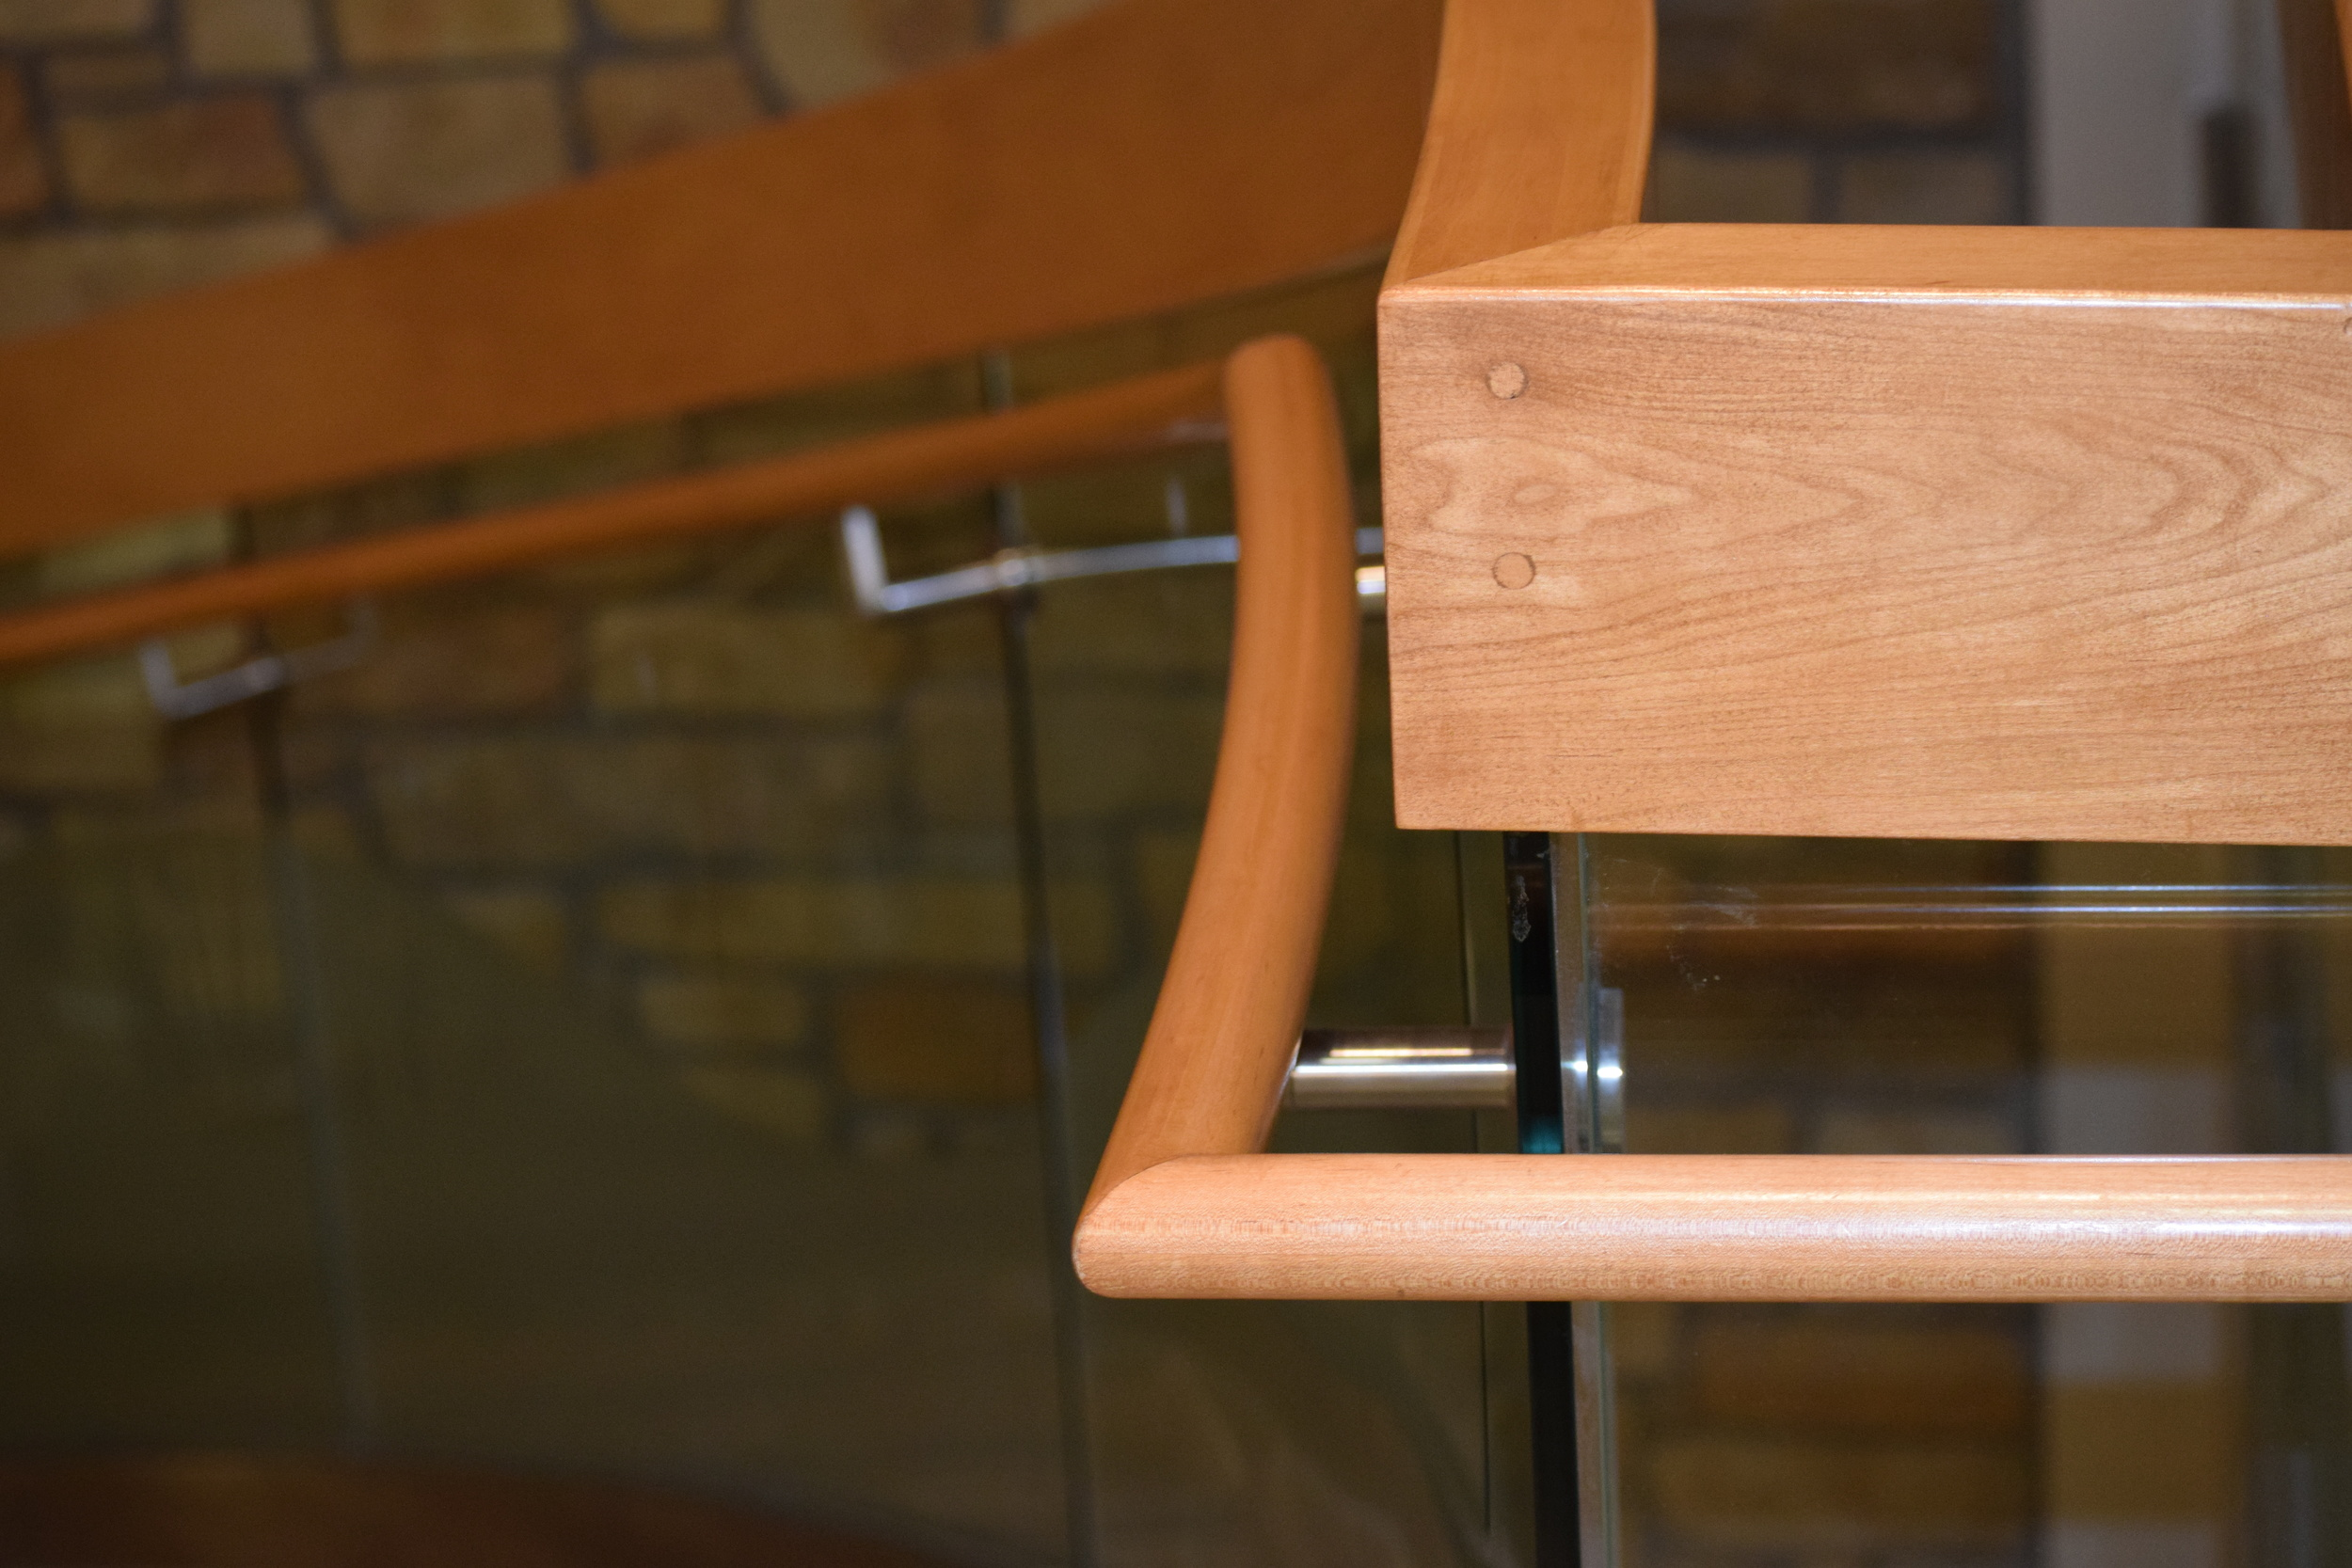 ARKANSAS CHILDREN'S HOSPITAL  Little Rock, AR  Wood guardrail and handrails